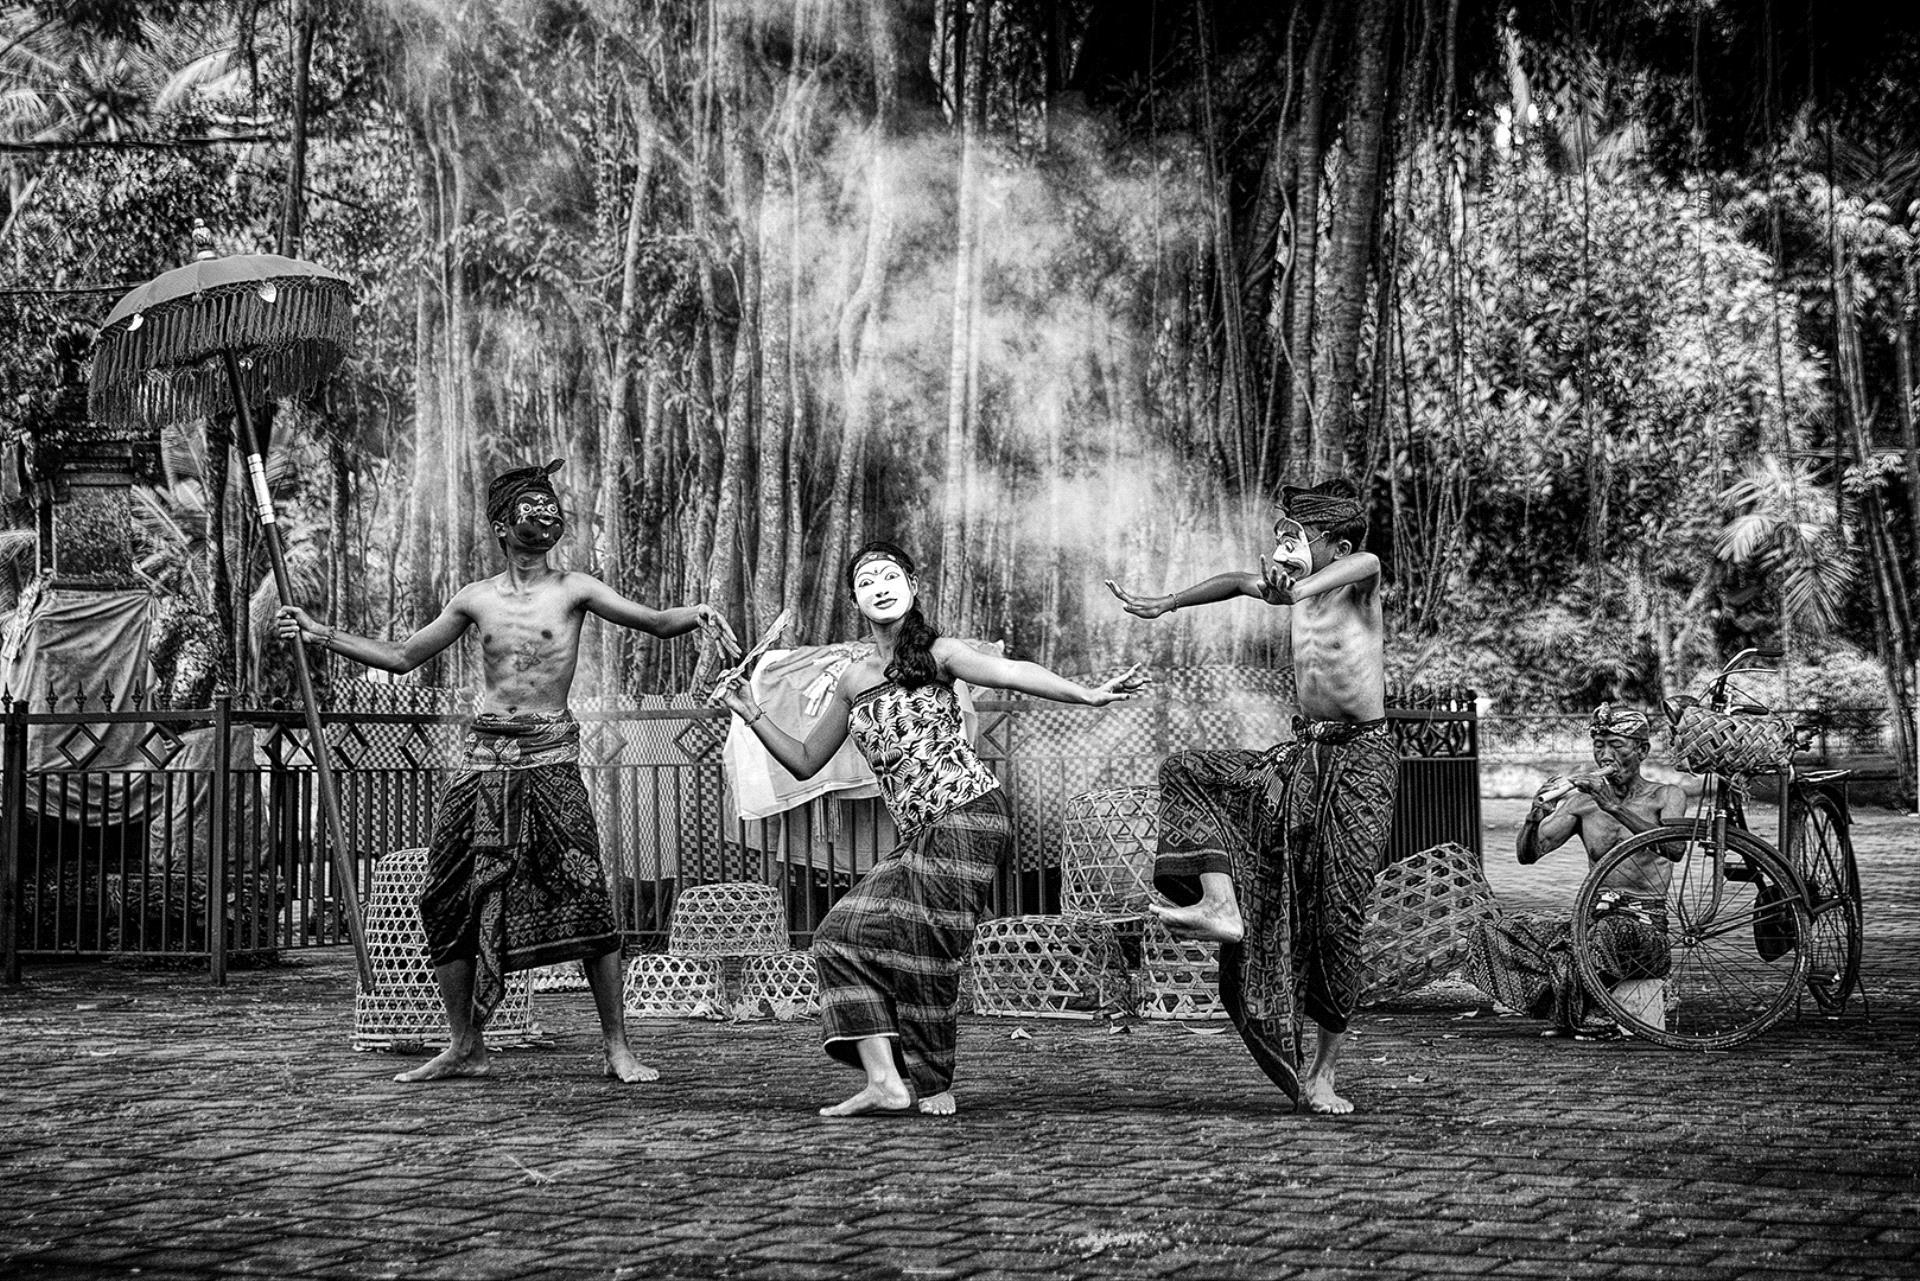 PSA HM Ribbons - Raymond Seh-Guan Goh (Singapore) <br /> Masked Bali Dancer